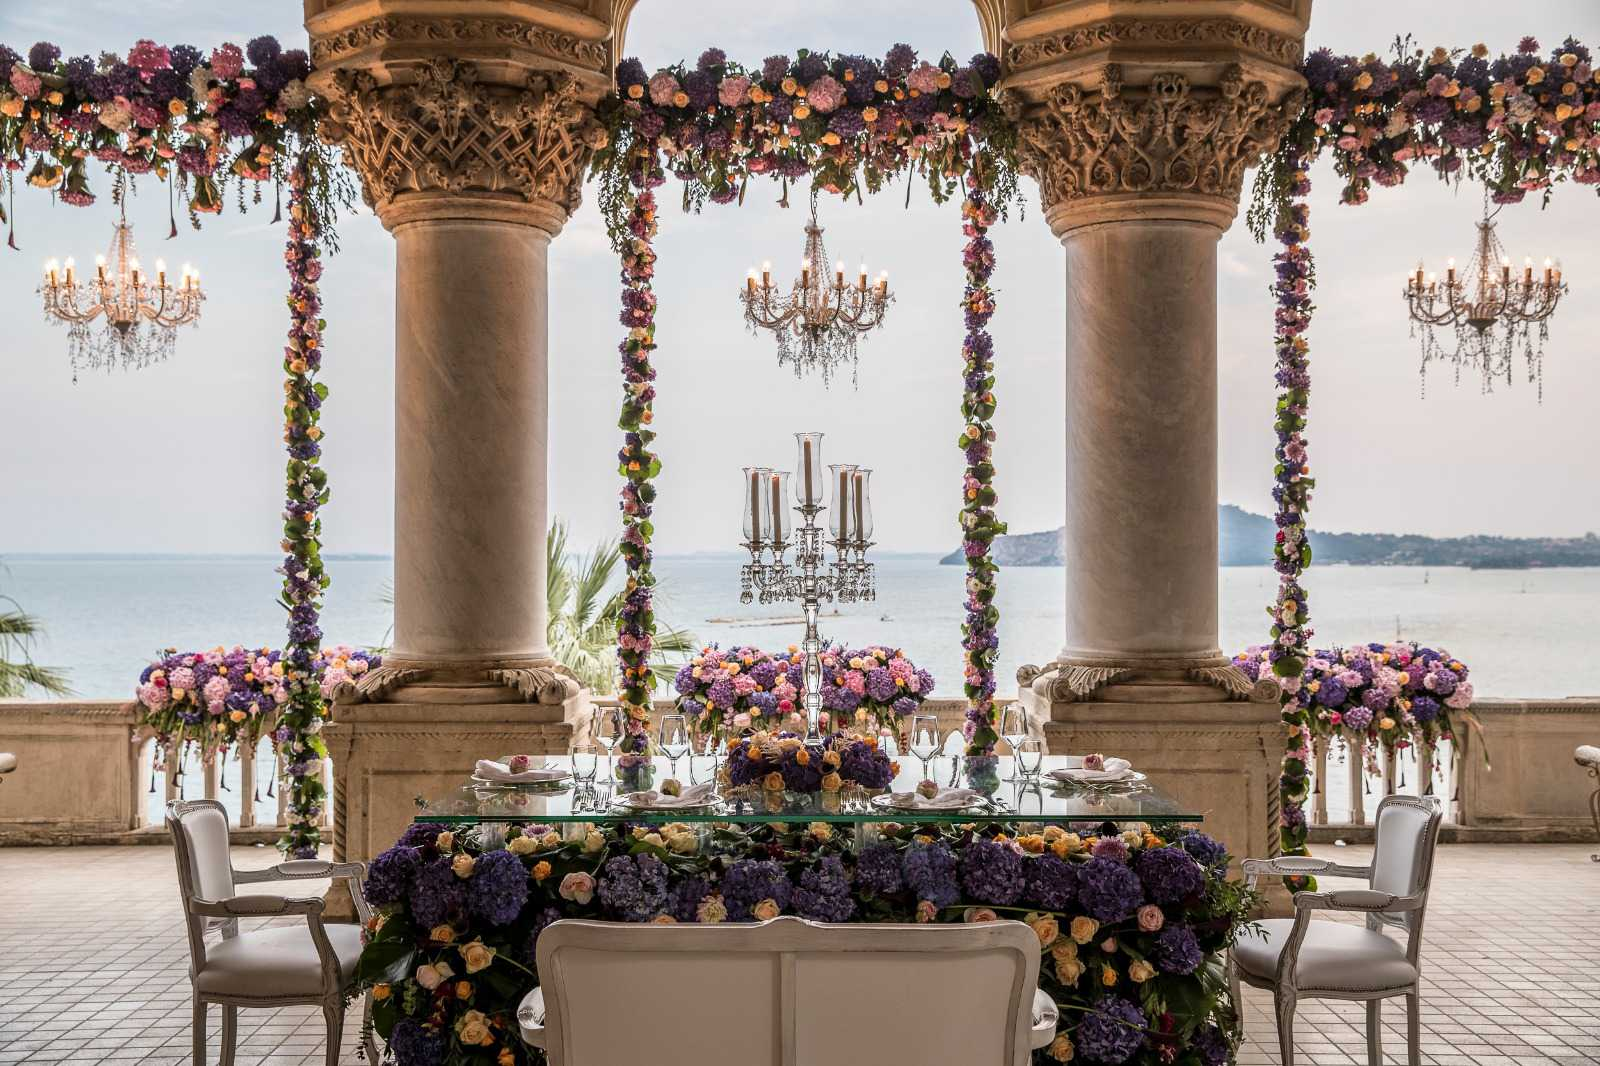 Svadba na ville borgese ostrov Garda (6)